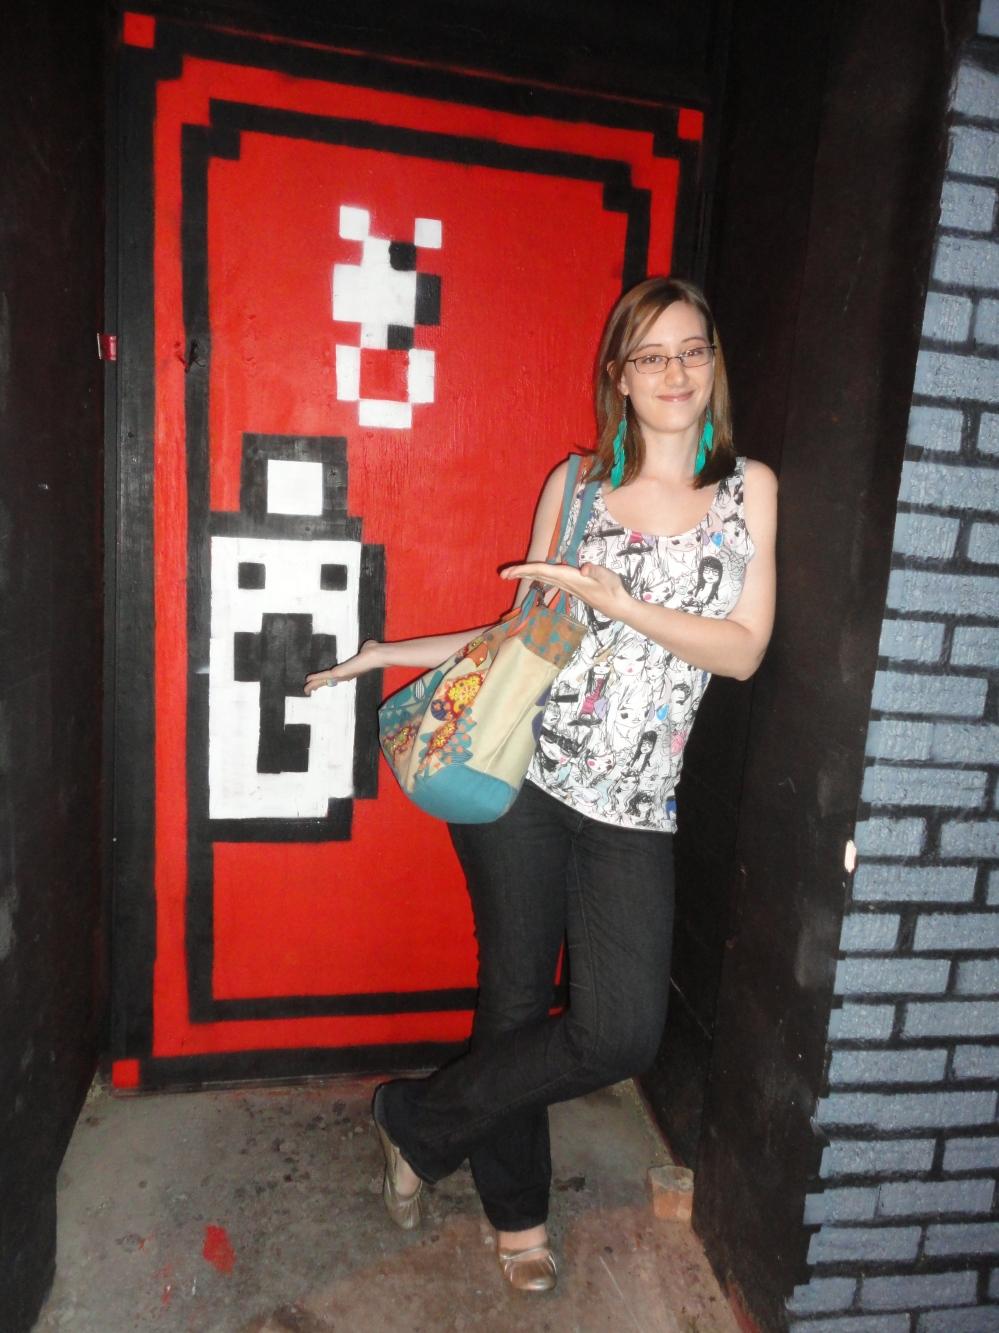 I see a red door..